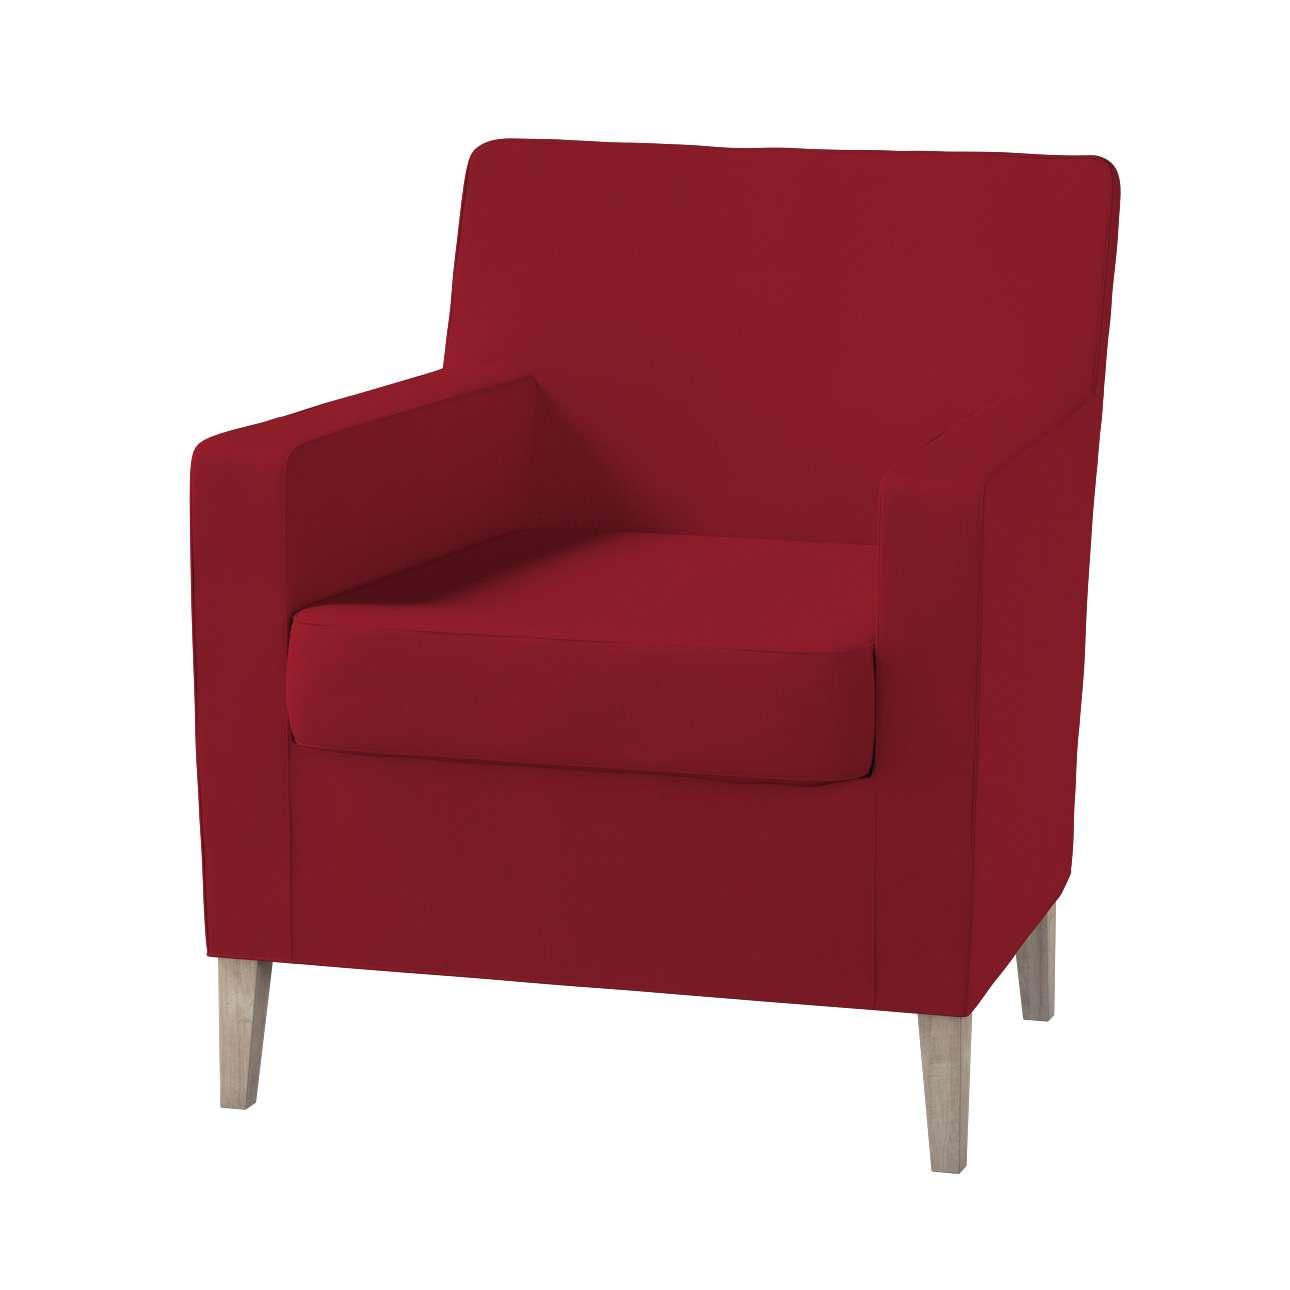 Pokrowiec na fotel Karlstad Fotel  Karlstad w kolekcji Chenille, tkanina: 702-24